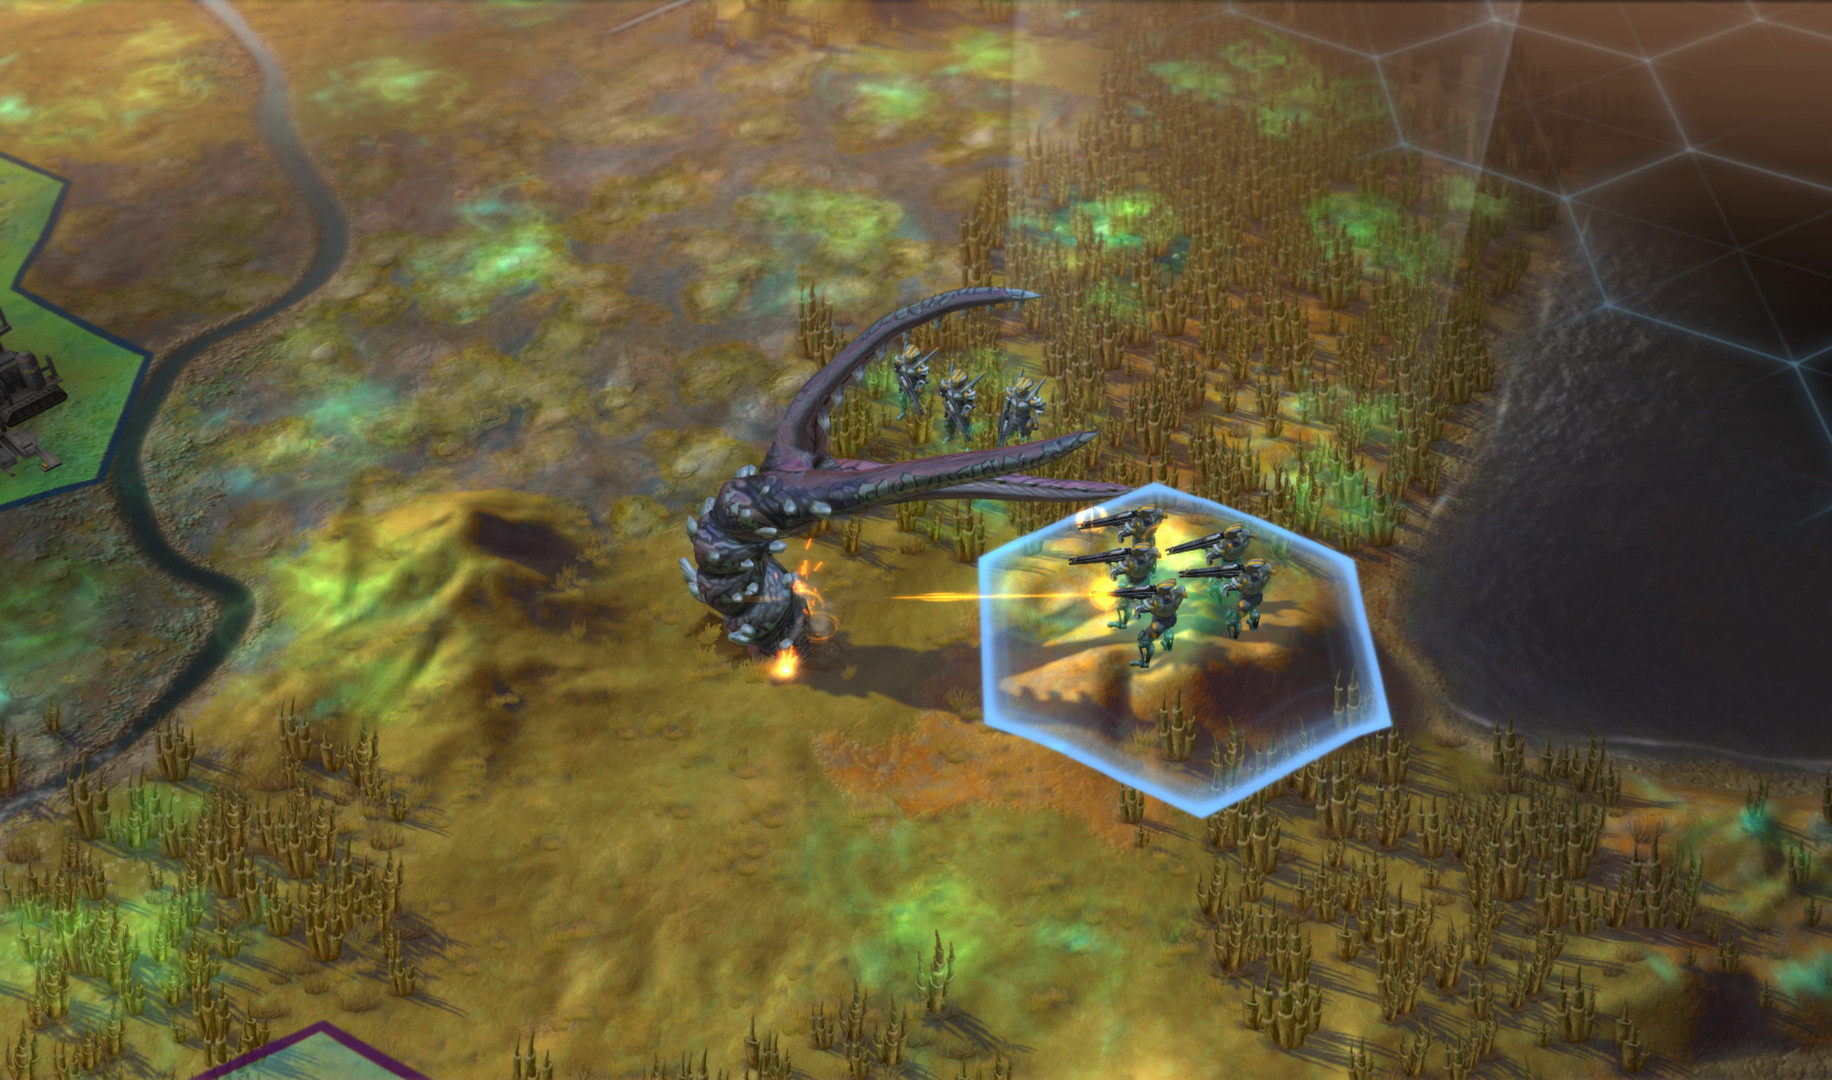 Скриншот Sid Meier's Civilization: Beyond Earth v1.0.1.607 (RePack) скачать торрентом